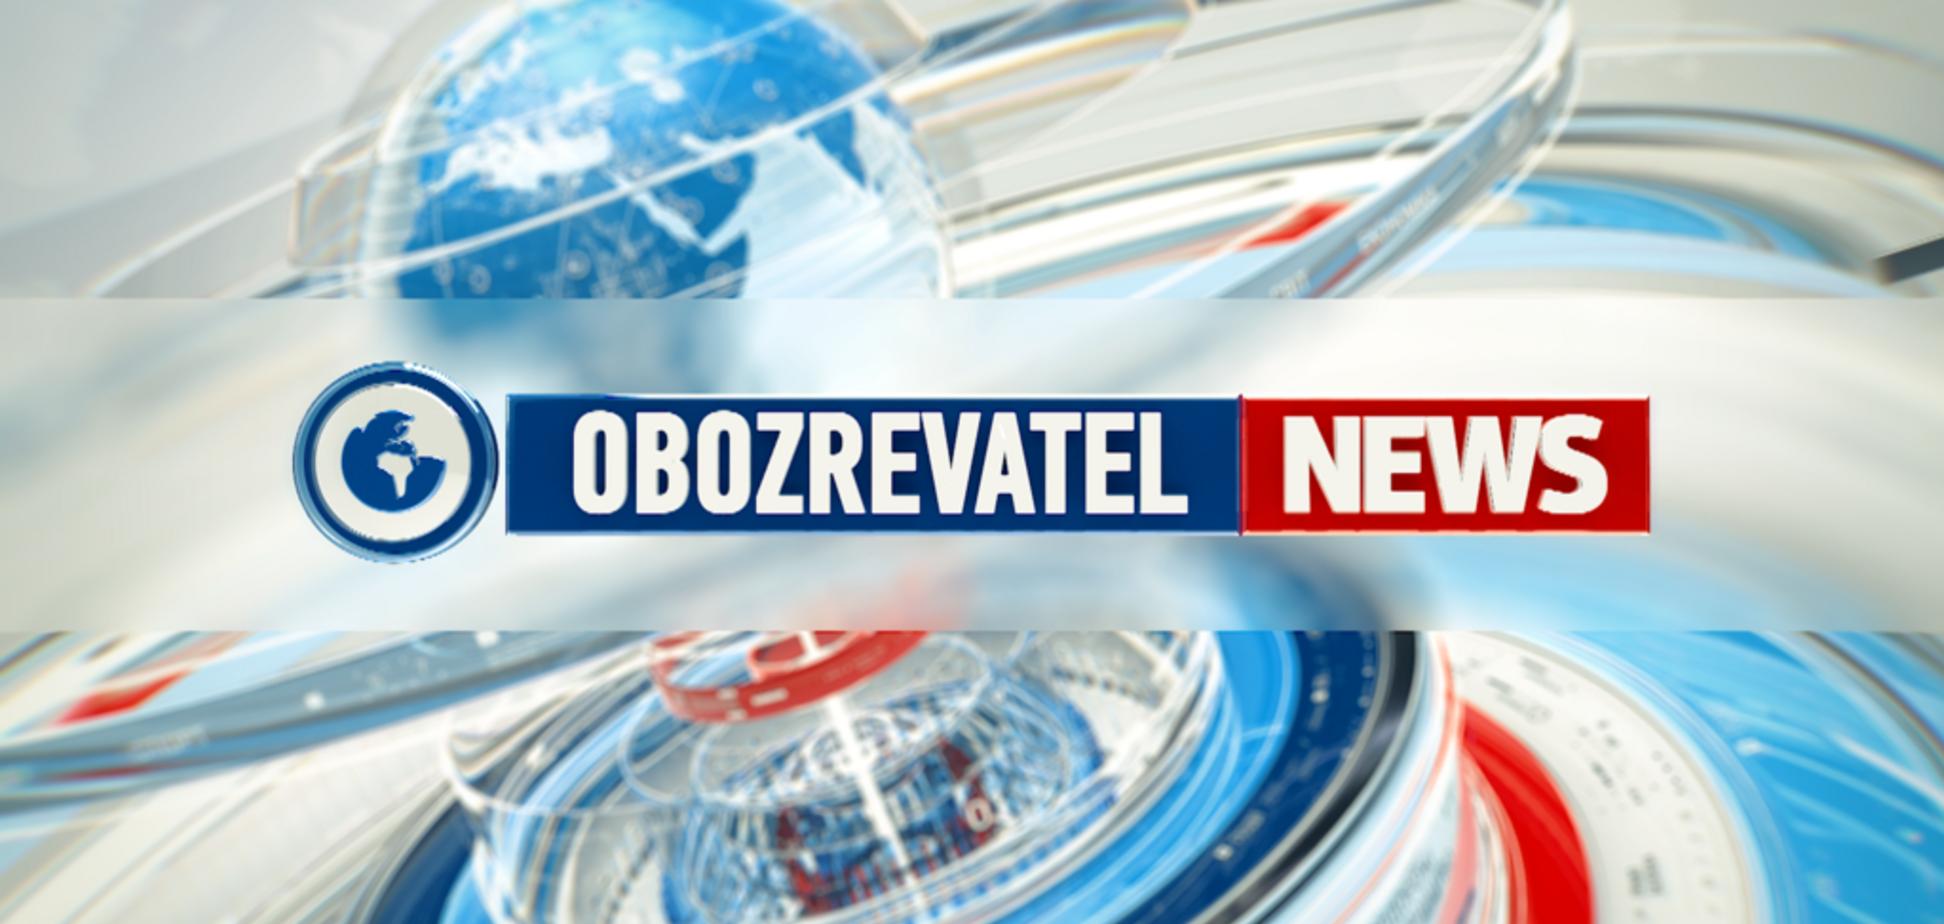 Обострение на Донбассе: Obozrevatel News